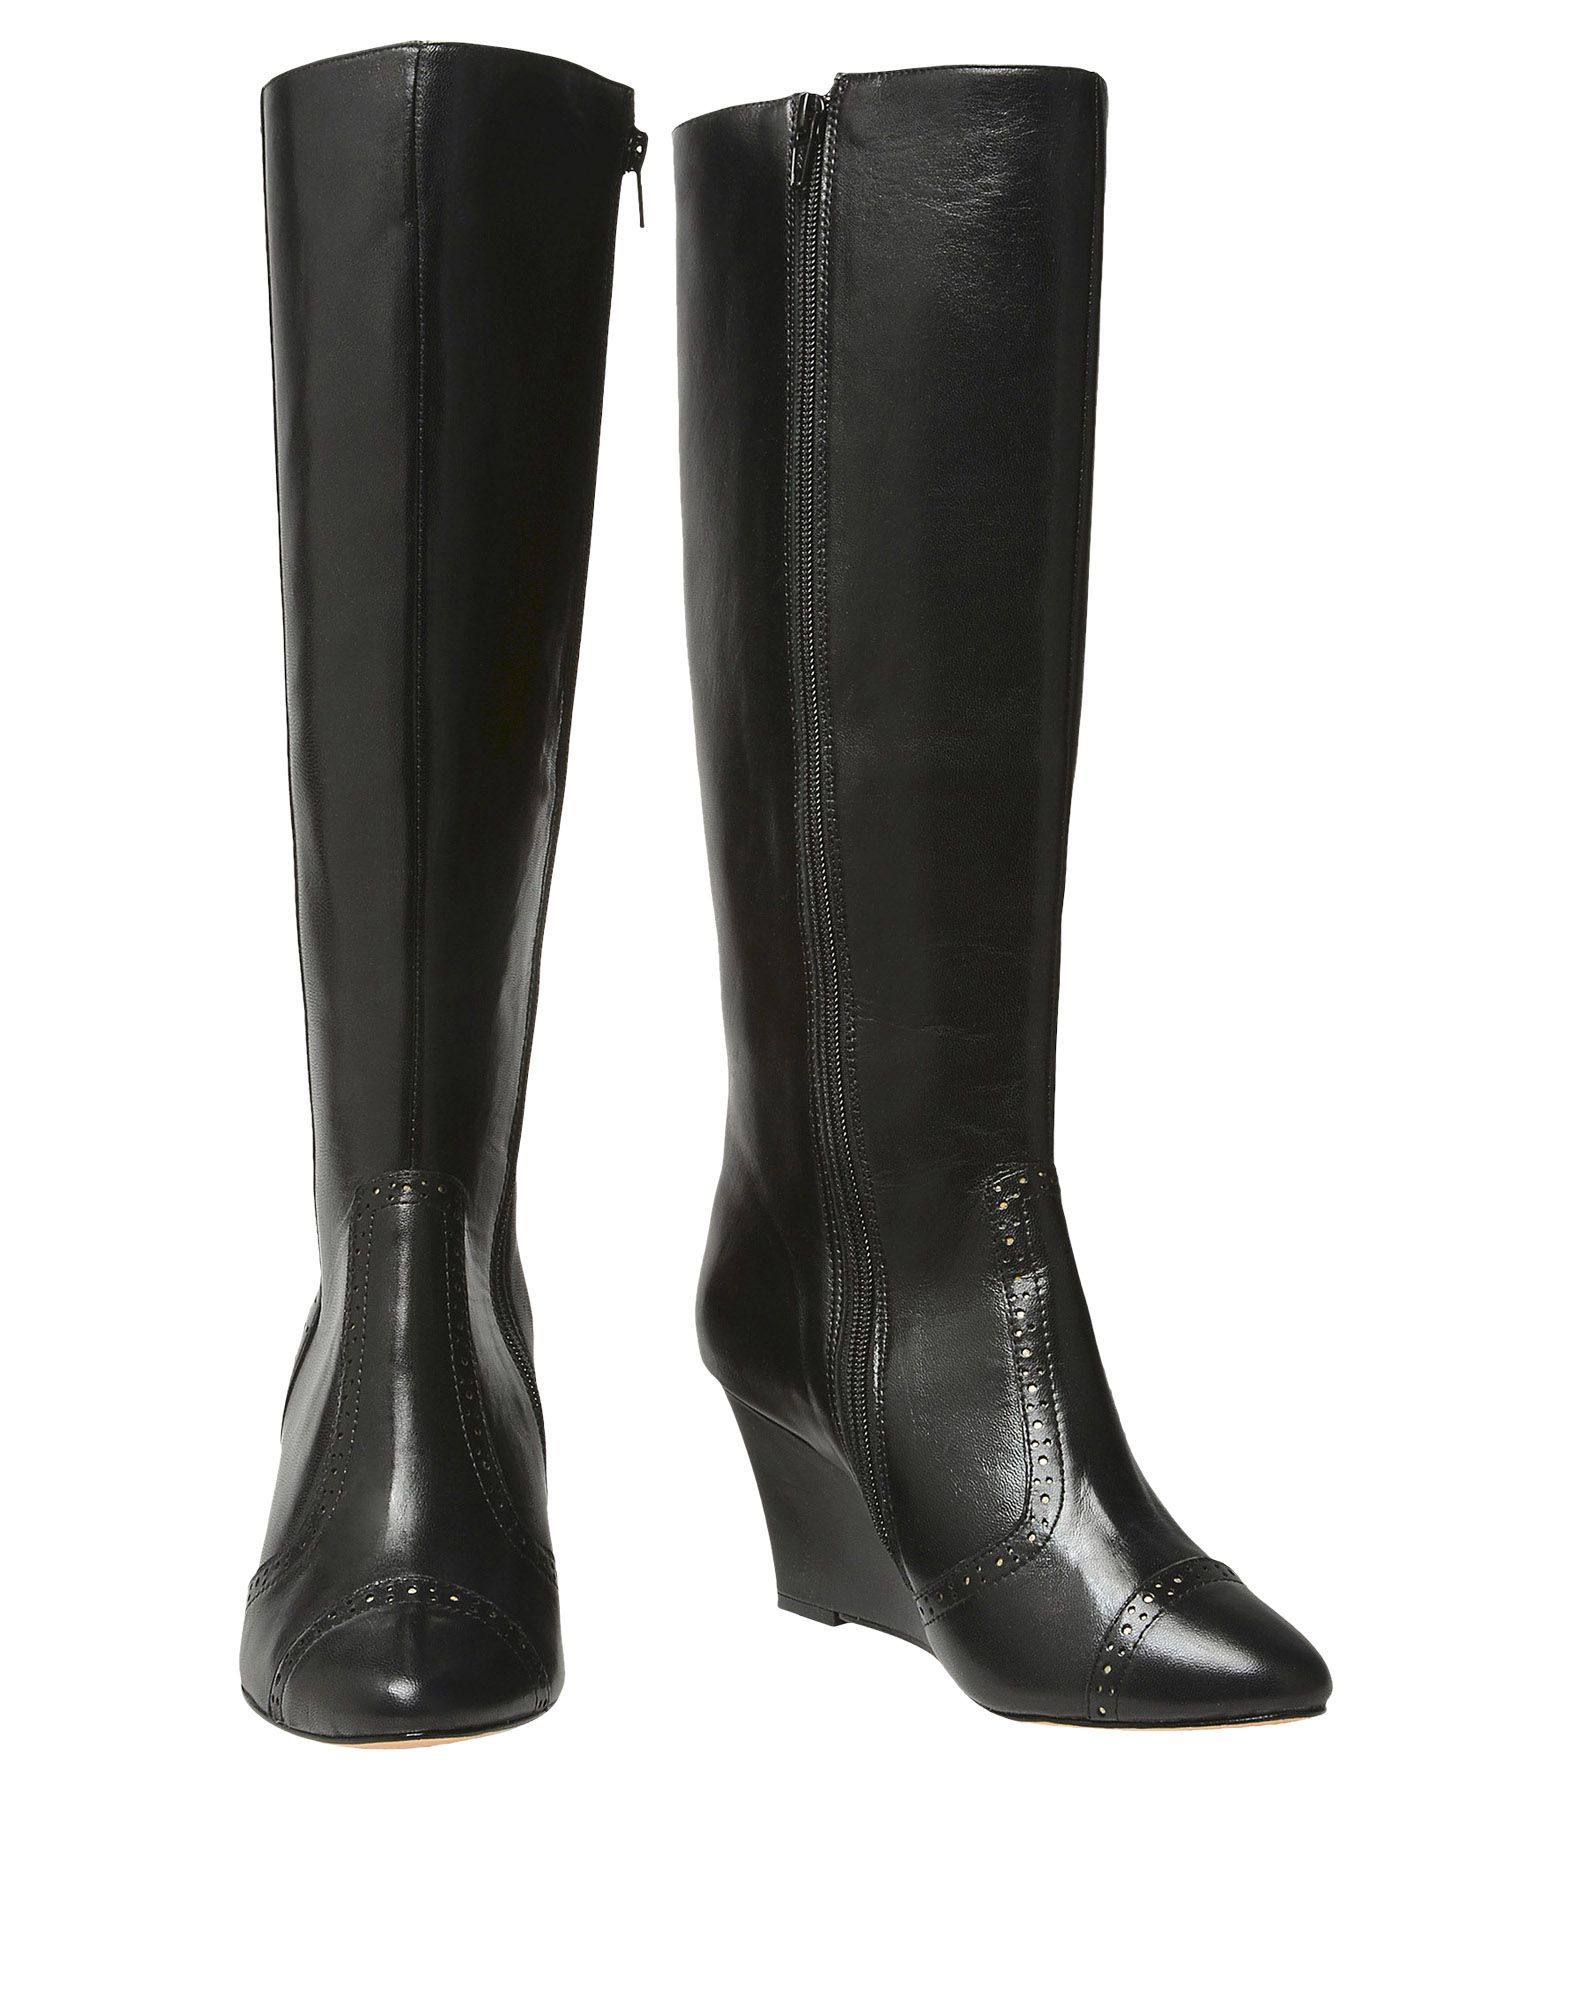 Lucy Choi London Stiefel Neue Damen  11446258OB Neue Stiefel Schuhe 3fbda5